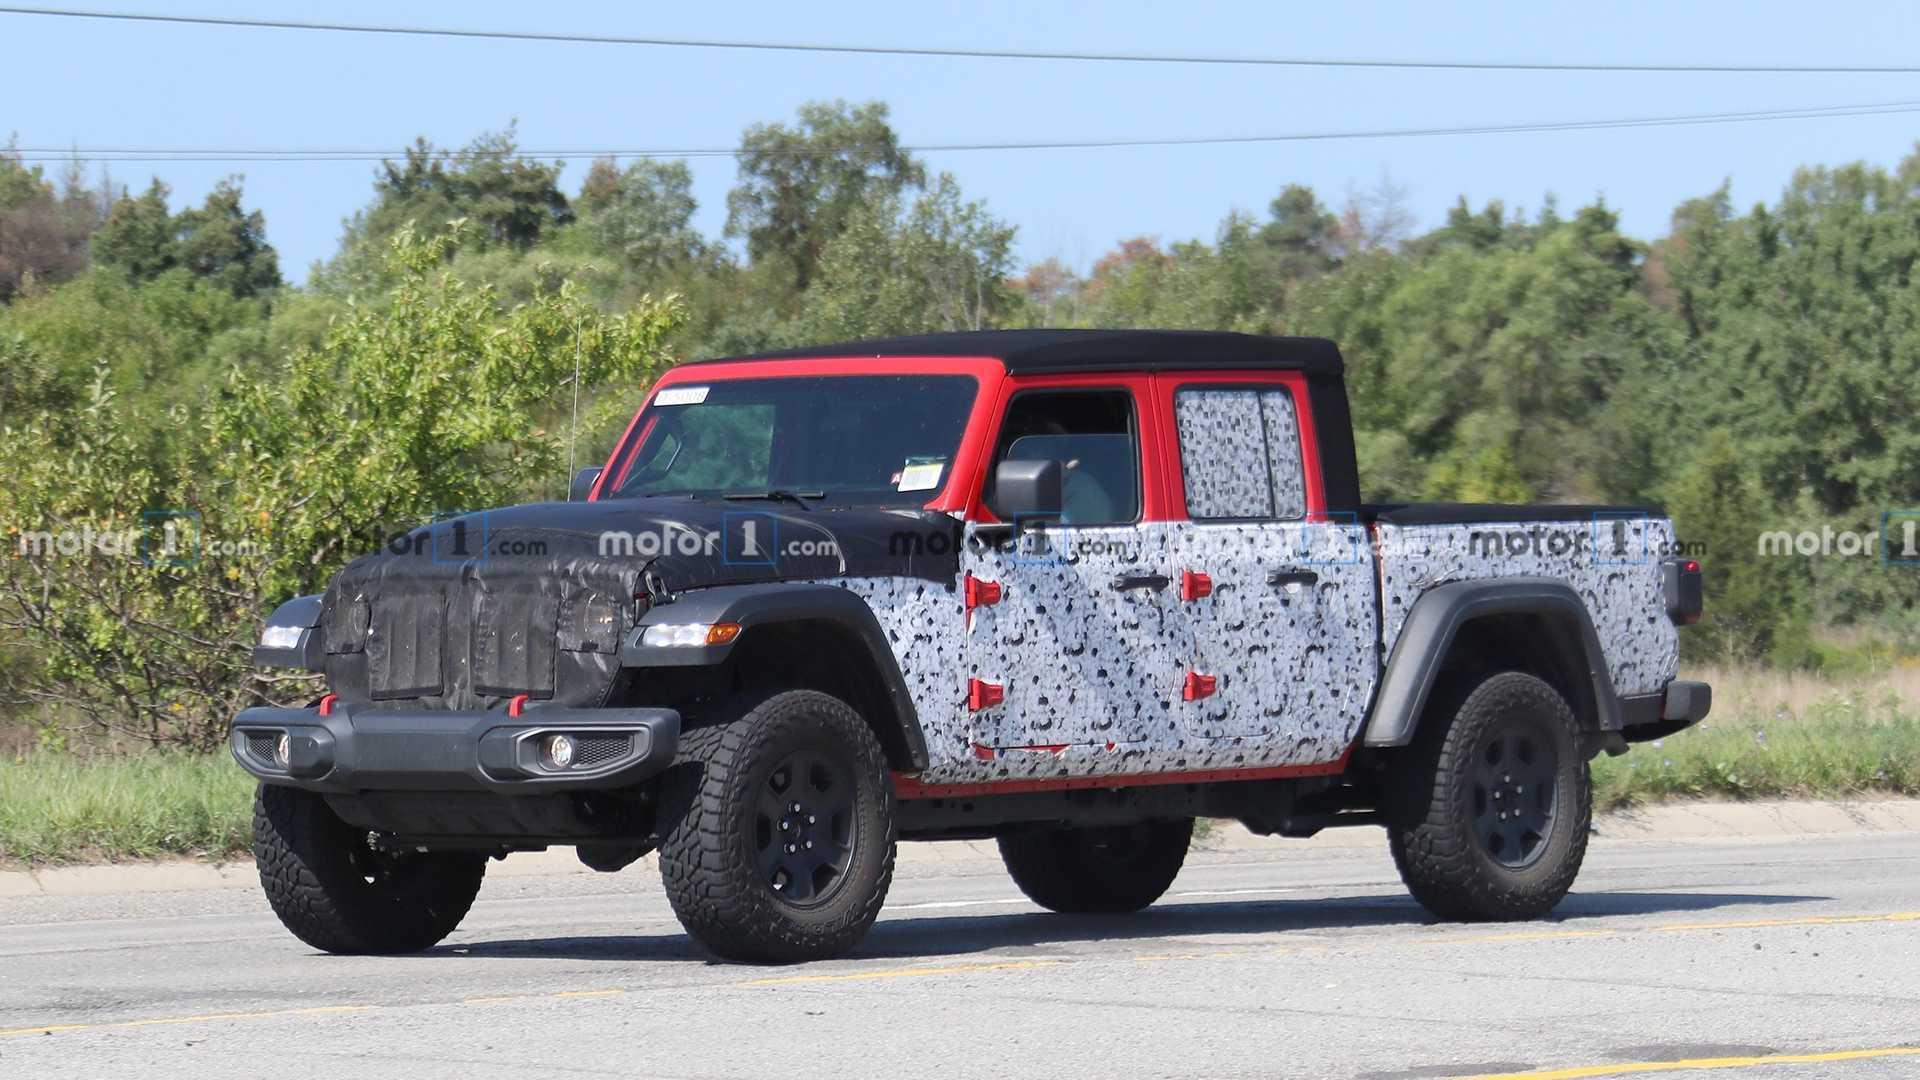 Fresh Spy Shots May Show Jeep Gladiator 'Hercules' With 500+ HP